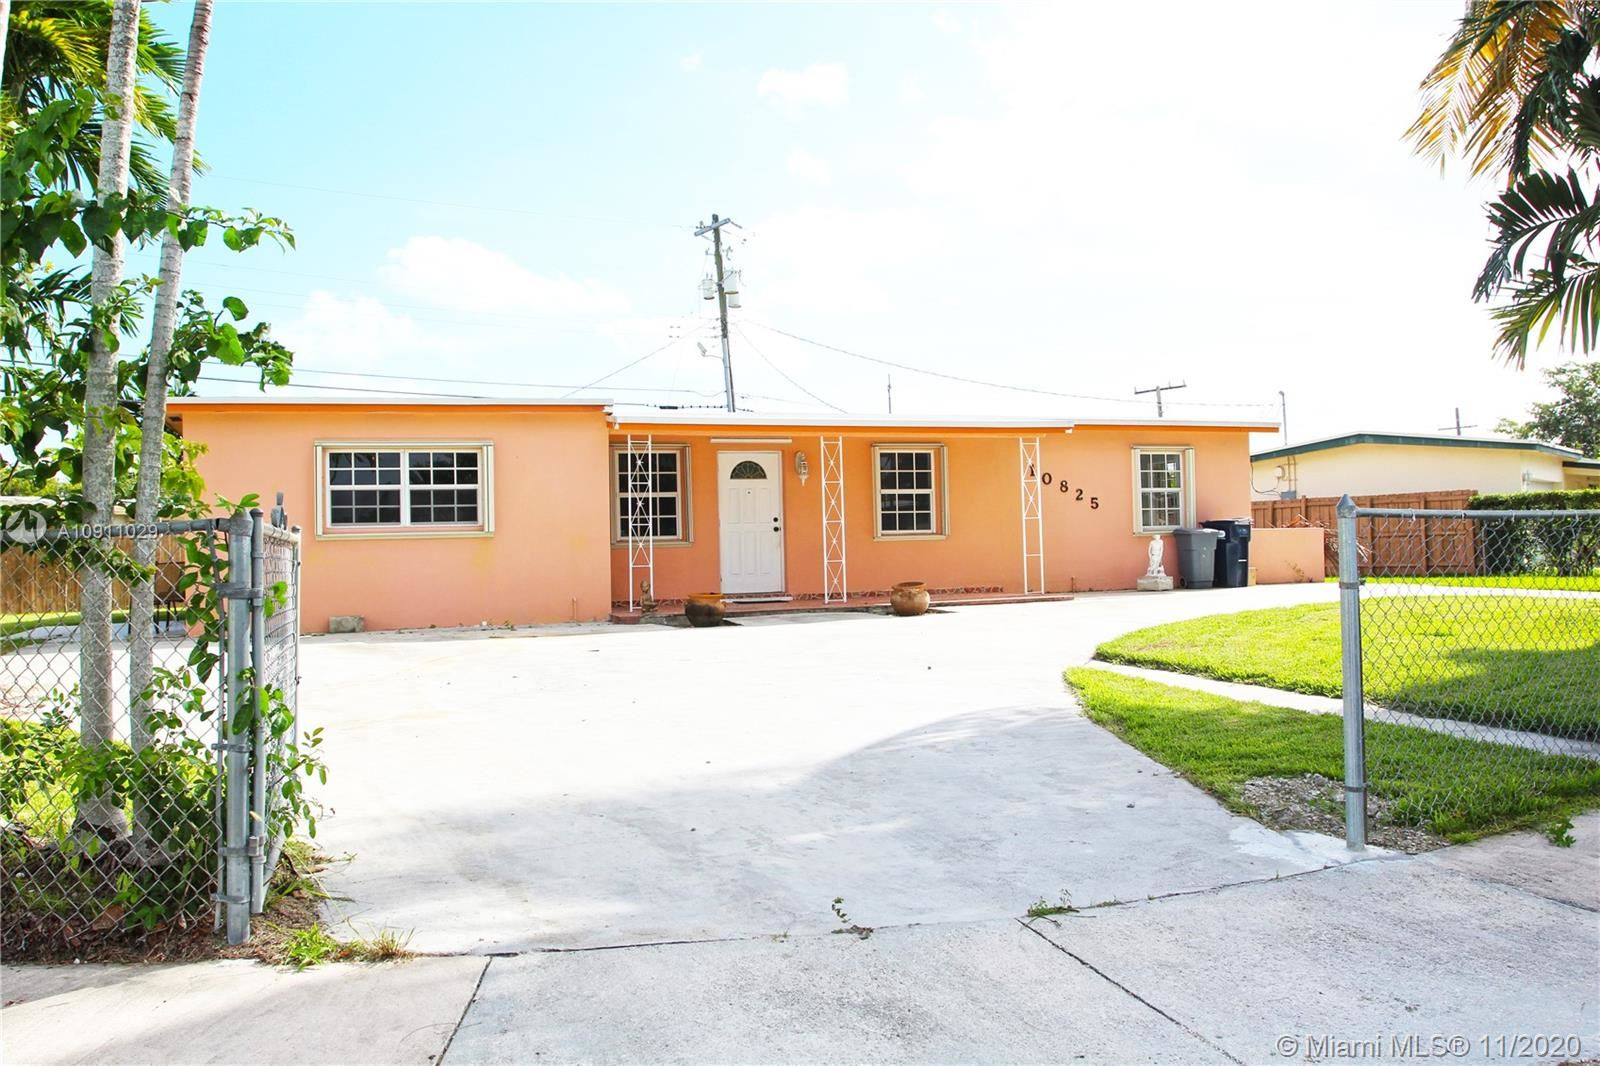 10825 SW 52nd Dr, Miami, FL 33165 - #: A10911029